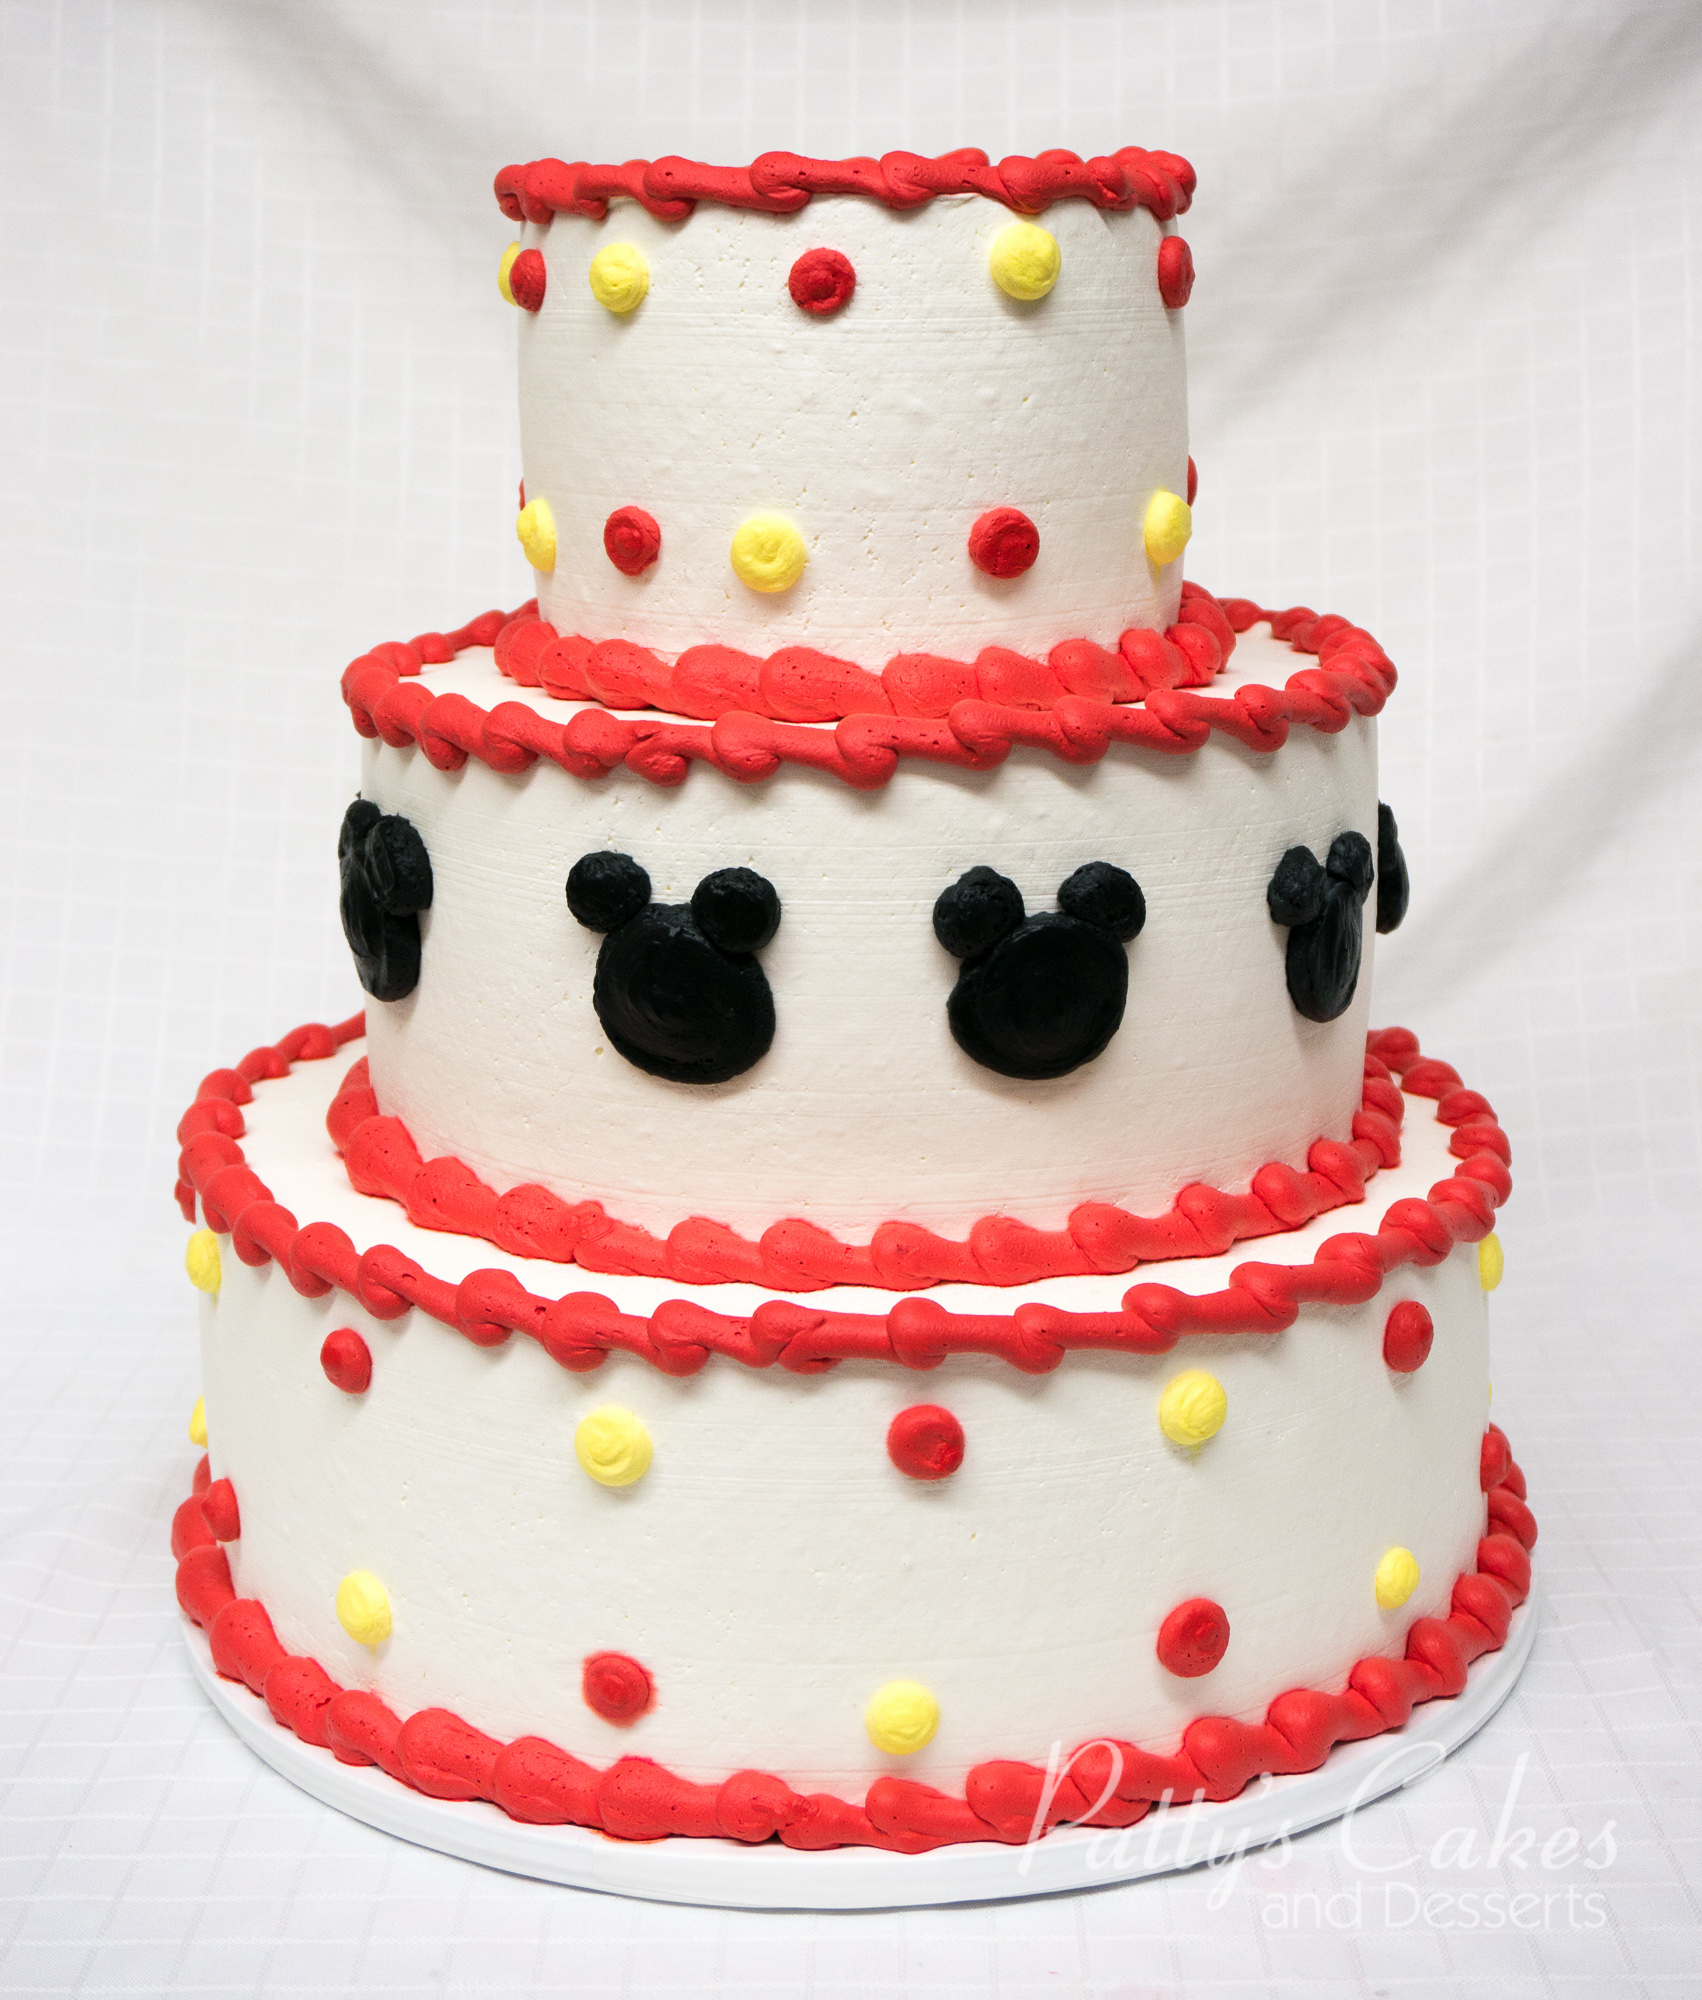 Artful Birthday Cake Pics